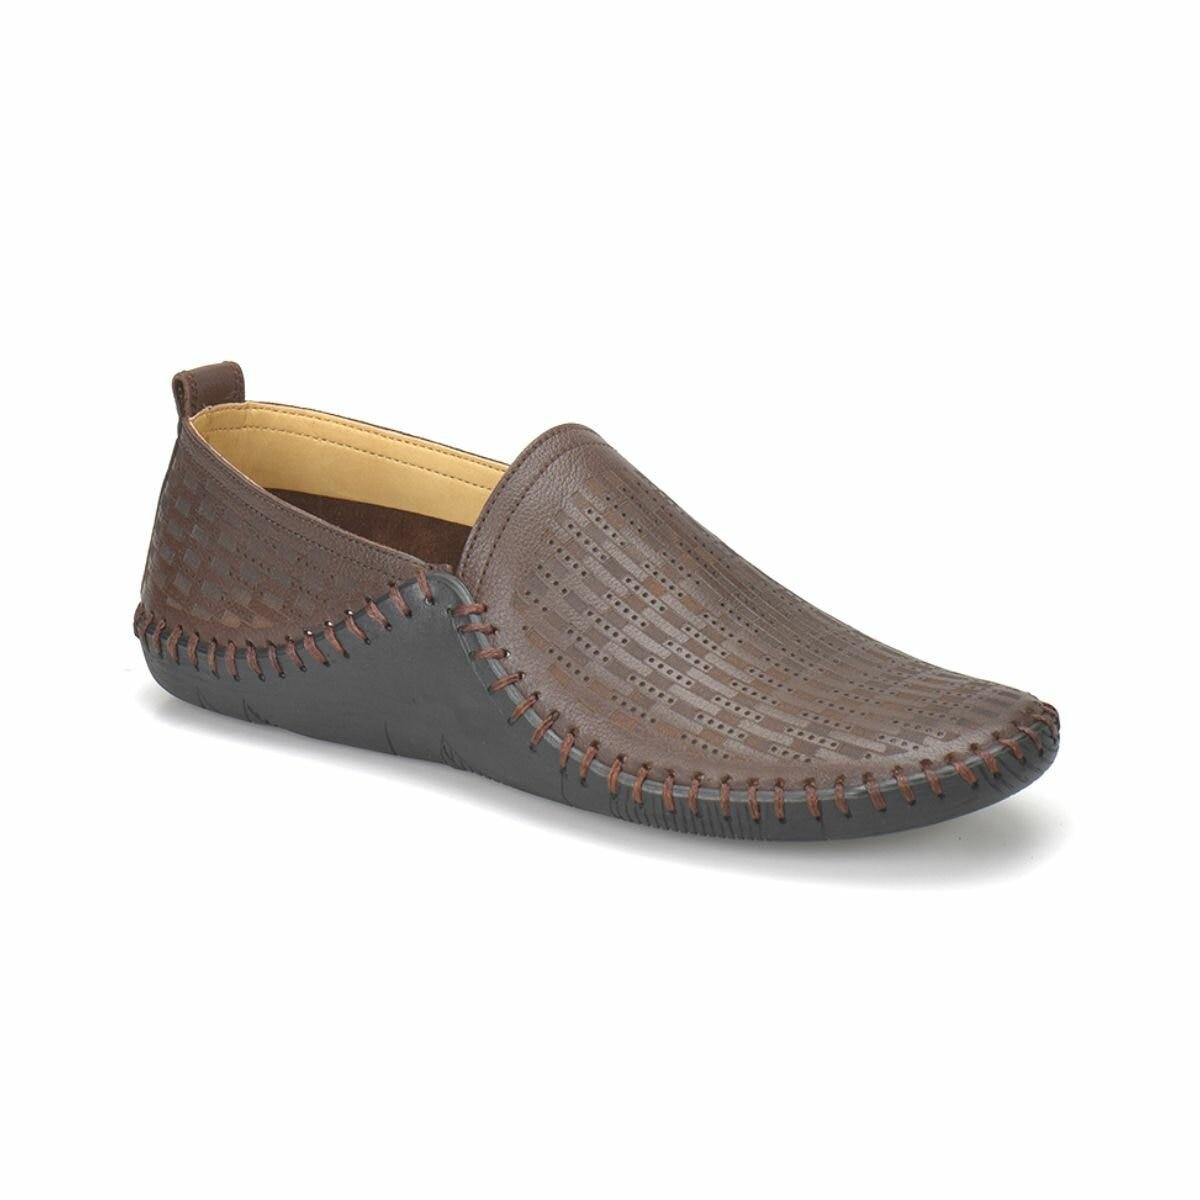 FLO G-102 M 1455 Brown Men 'S Modern Shoes Flogart